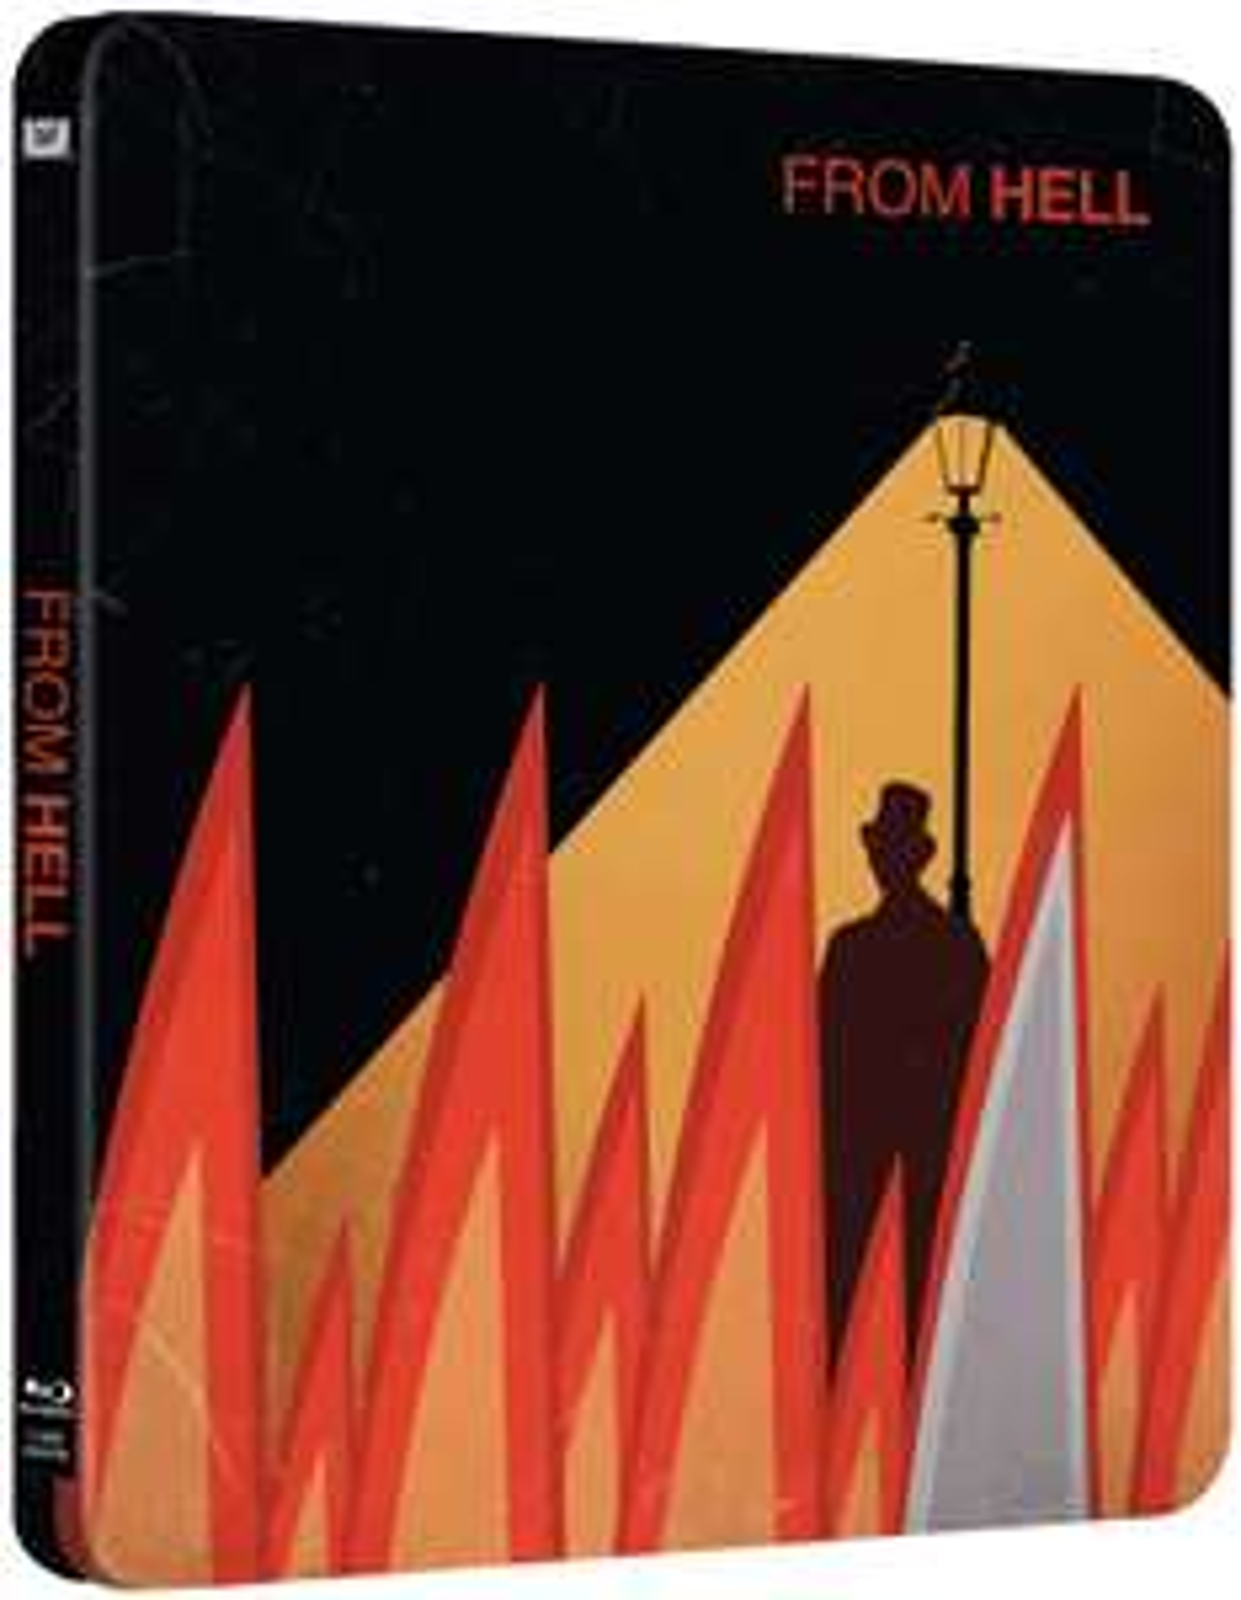 From Hell - Limited Edition Steelbook (Blu-ray) für 6,99€ (Zavvi.de)